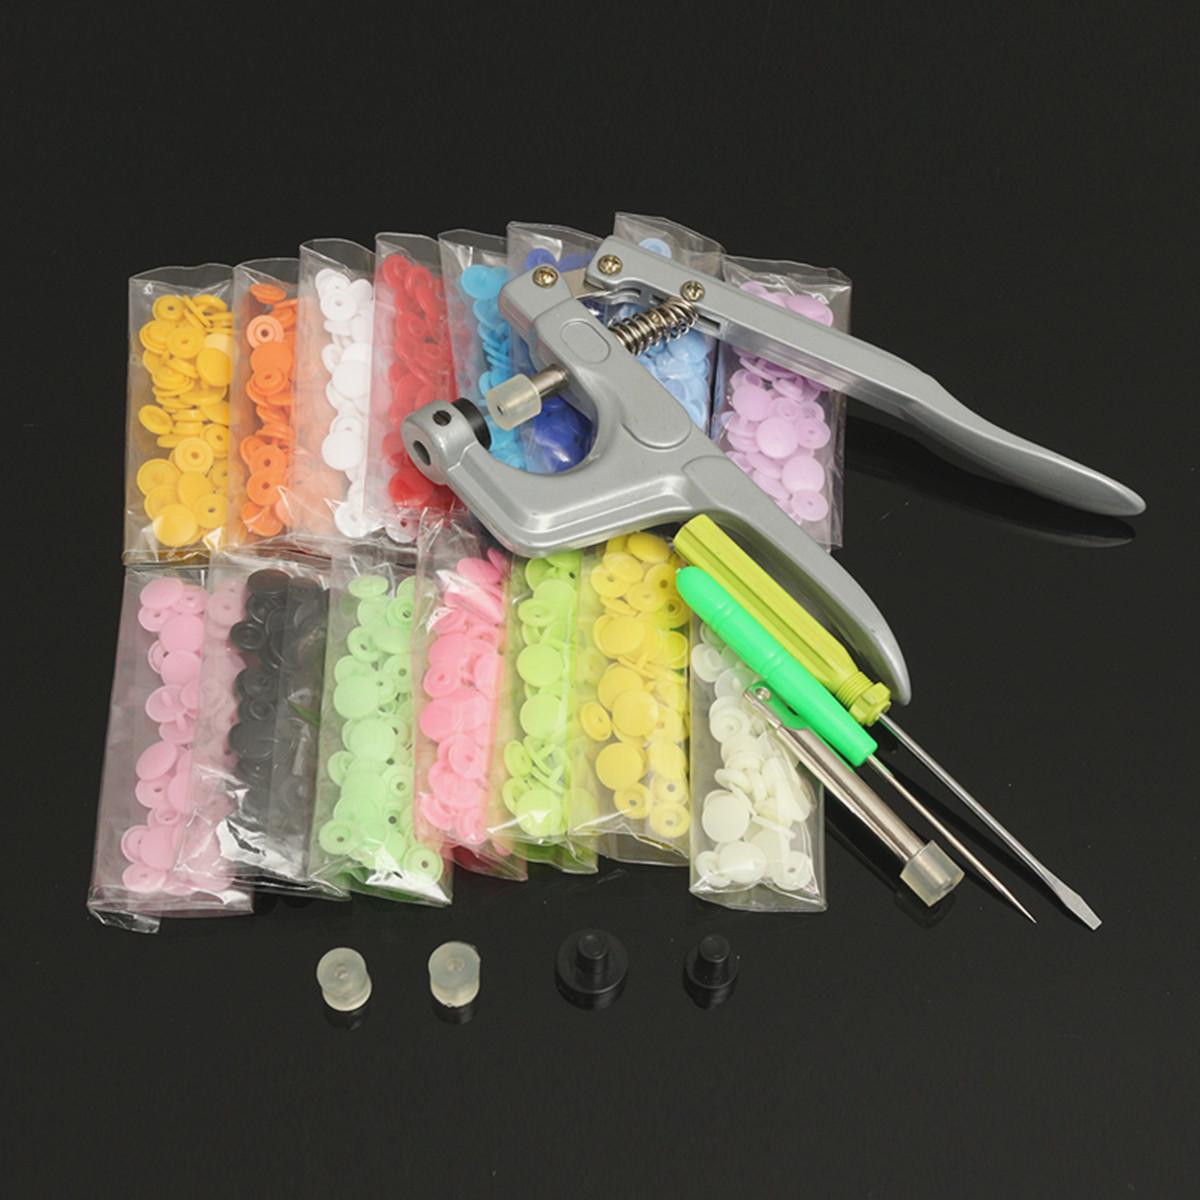 150Pcs/Set Plastic Resin T5 Fastener Snap Kam Buttons Pliers Kit DIY Crafts